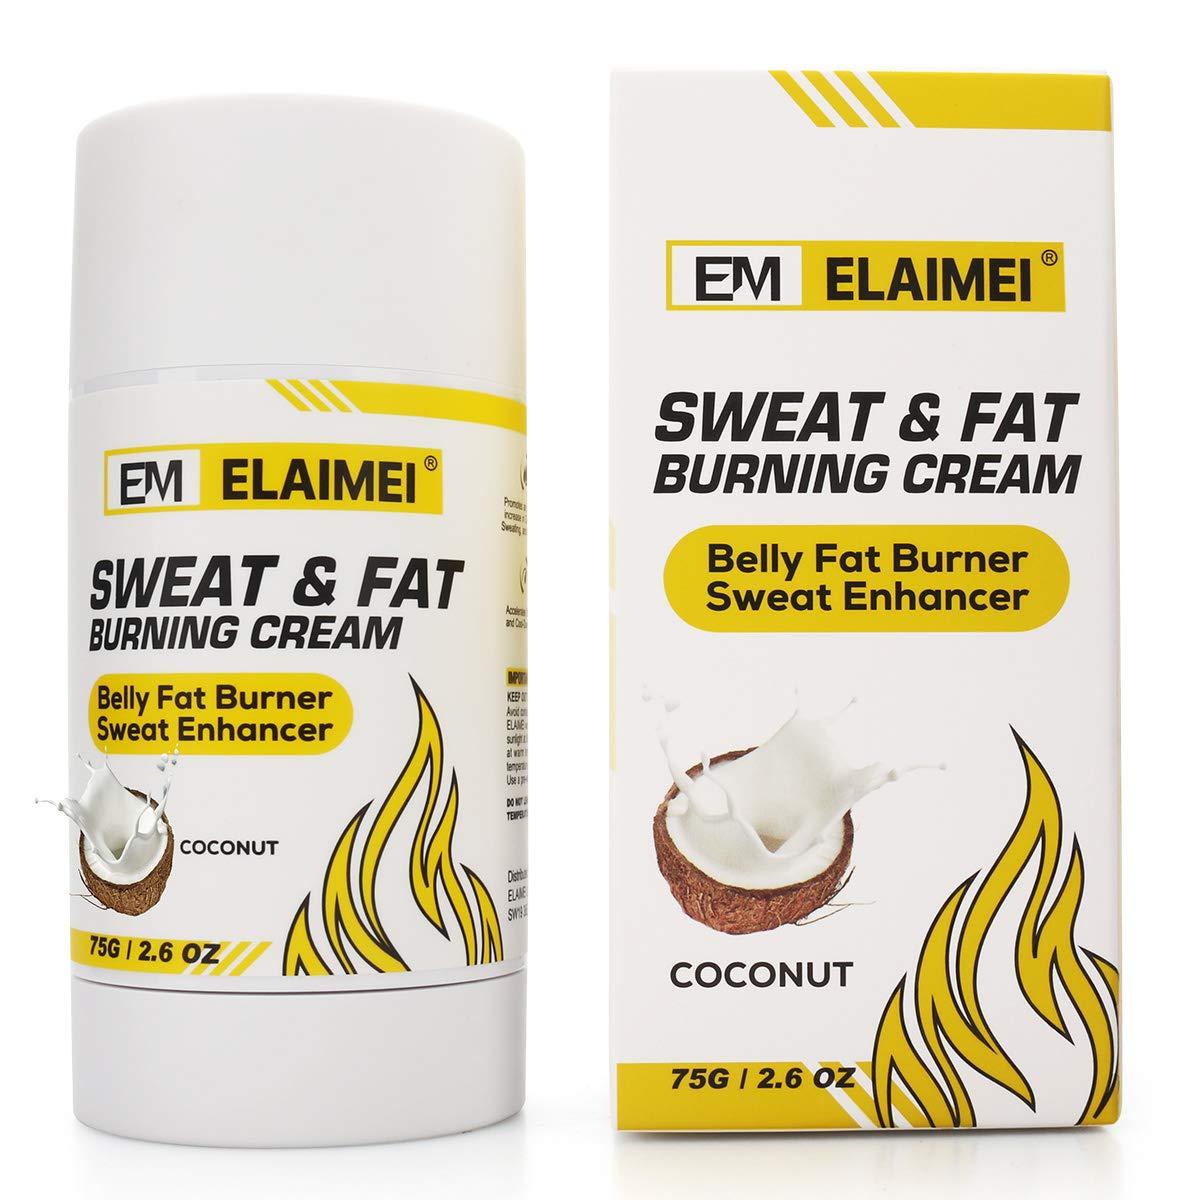 Hot Cream Abdominal Cream Rotating Abdominal Cream Belly for Cellulite Removal Cream Fat Burner Six Pack Abs Muscle Stimulator Creams Leg Body Waist Effective Anti Cellulite Fat Burning - white